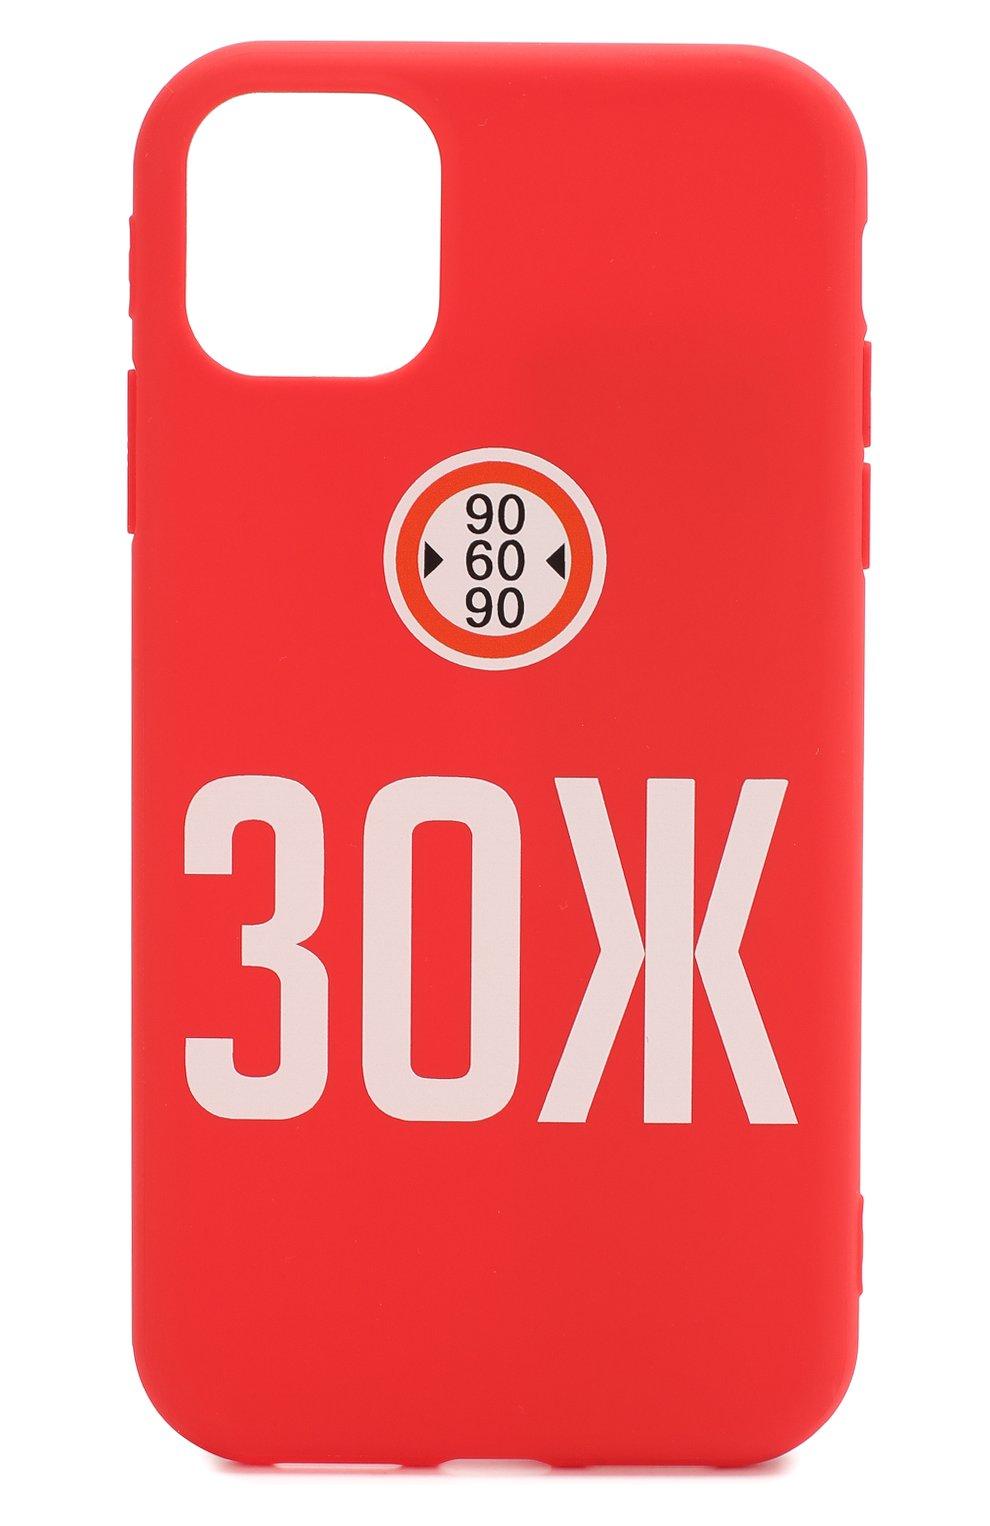 Мужской чехол для iphone 11 MISHRABOO красного цвета, арт. ЗОЖ 11 | Фото 1